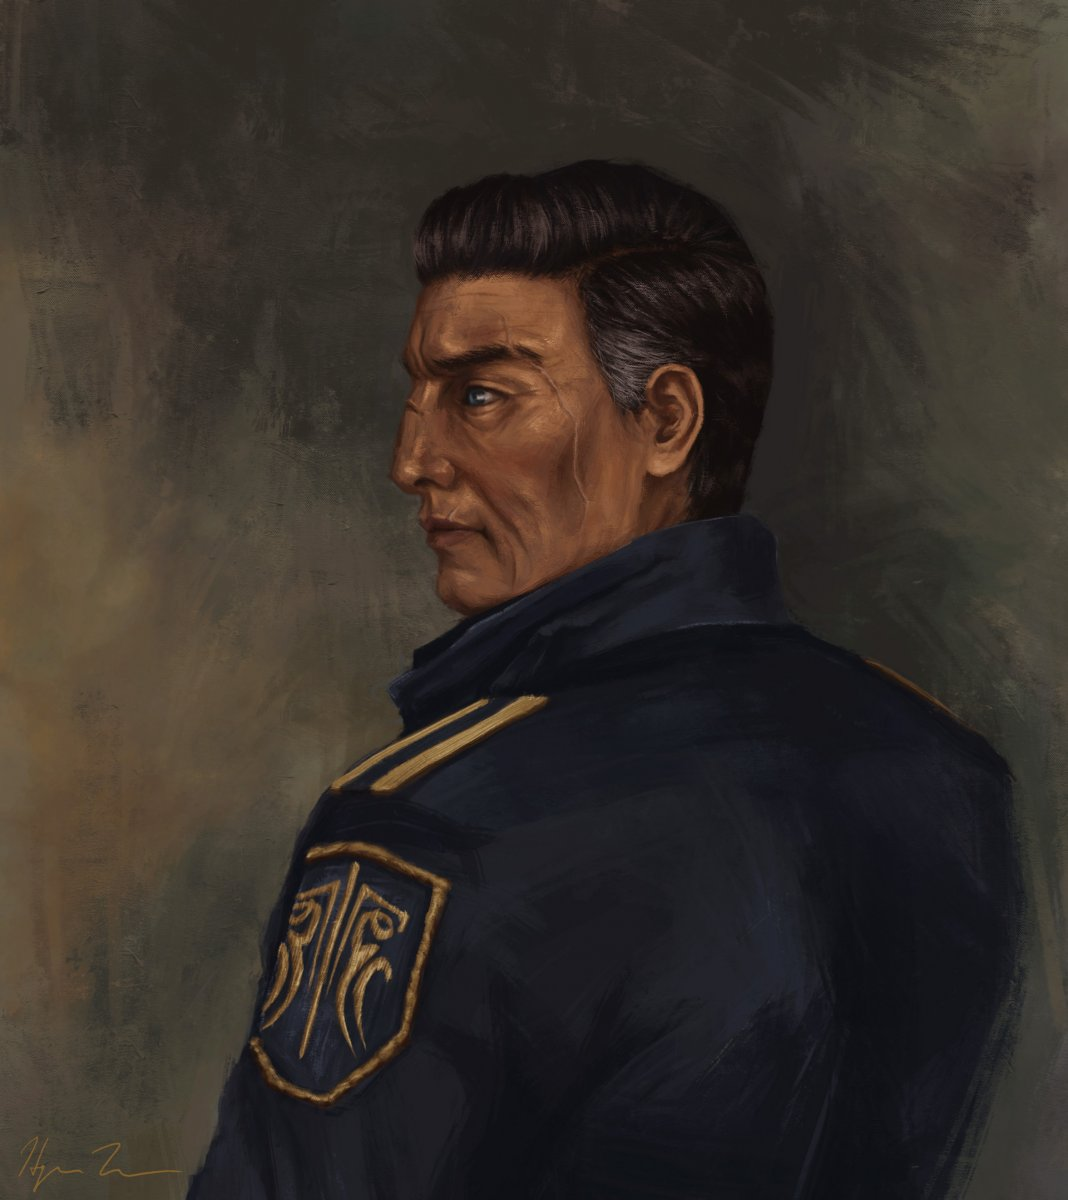 Dalinar Kholin - portrait